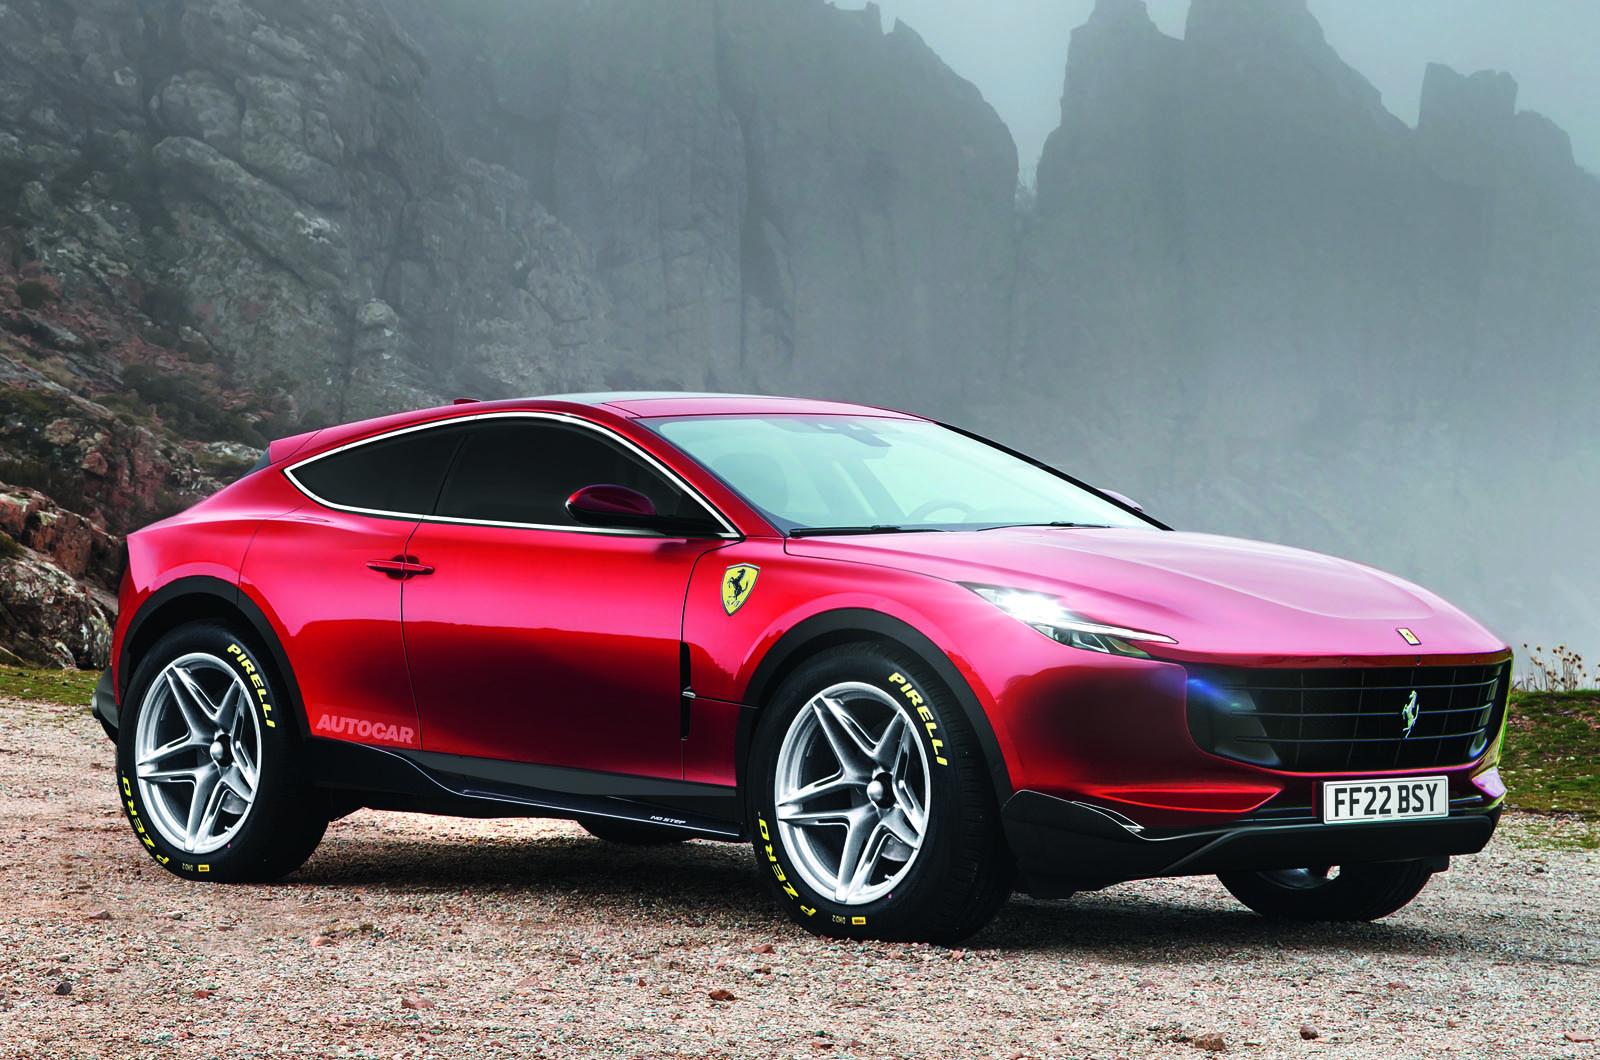 Ferrari S 2022 Performance Suv First Prototype Caught Testing Autocar